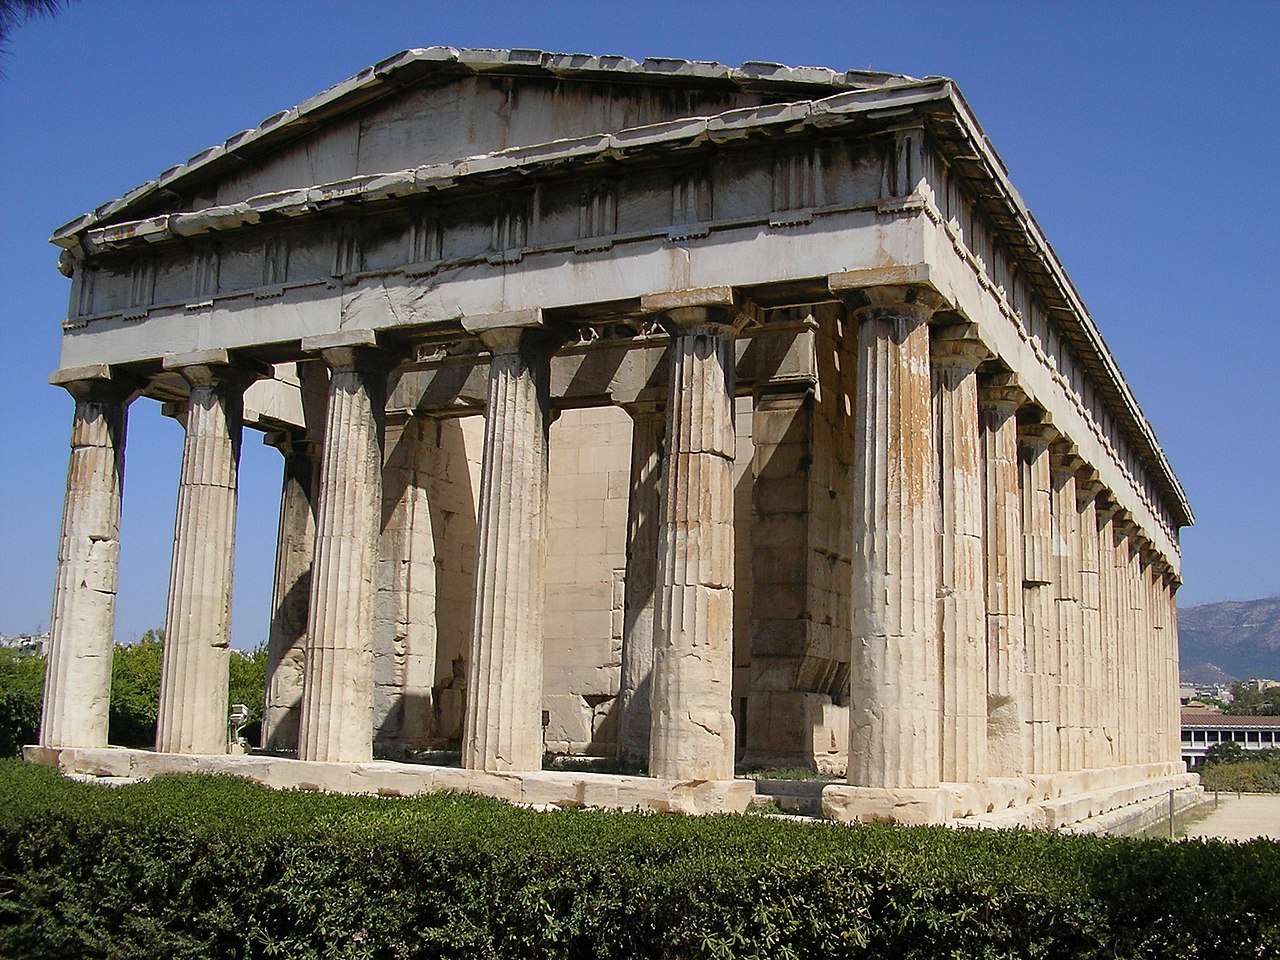 FileHephaistos temple 2006jpg Wikimedia Commons